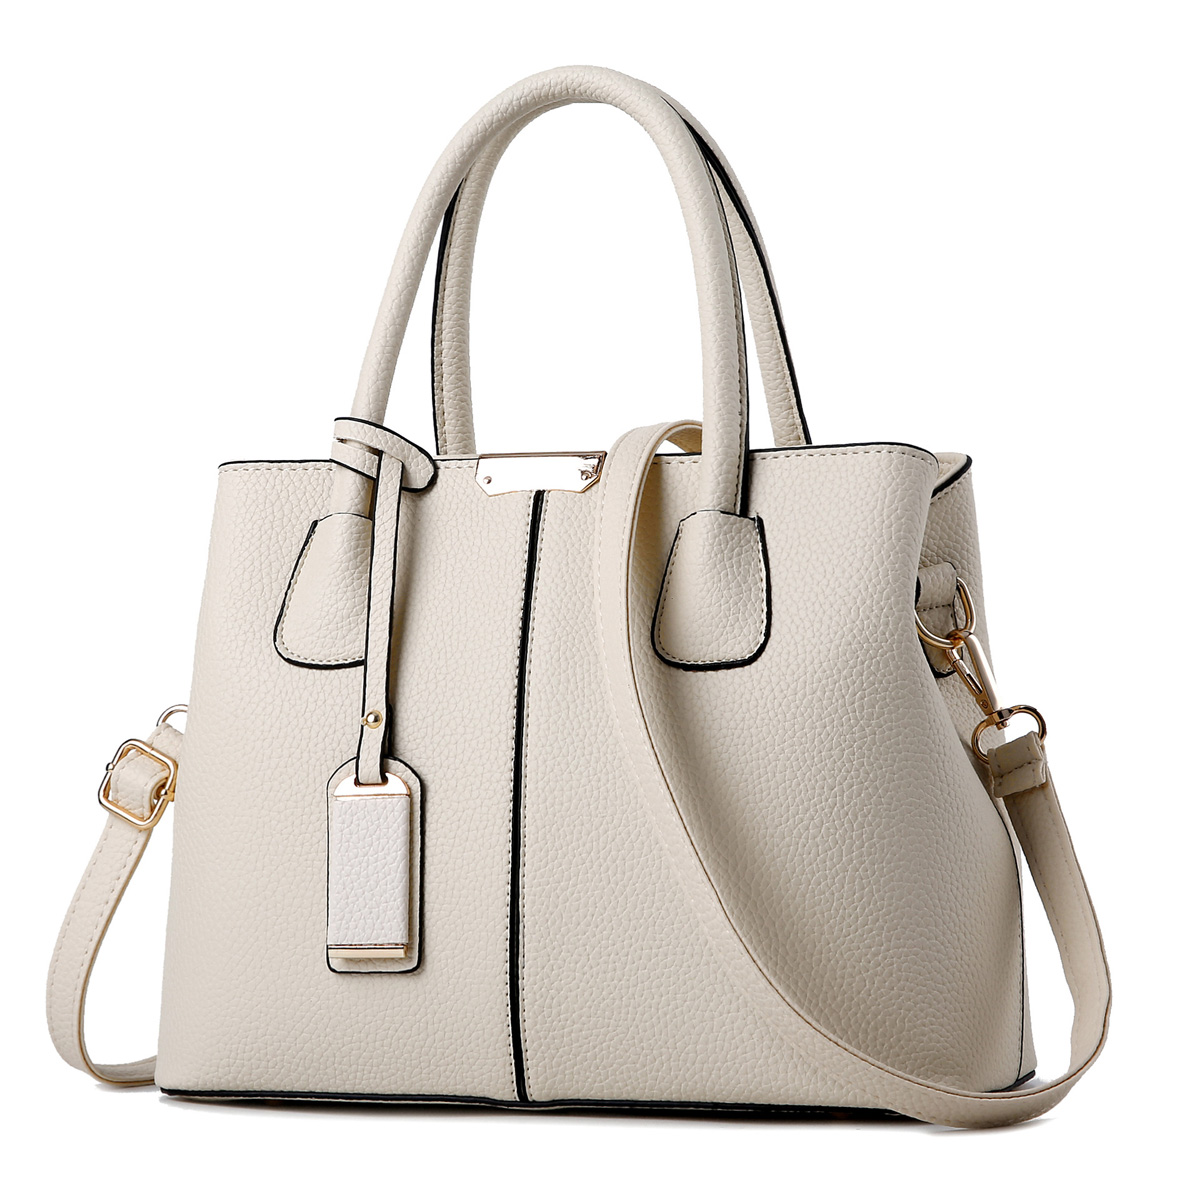 Women Top Handle Handbags Elegant Leather Shoulder Messenger Bags for Young Ladies 1